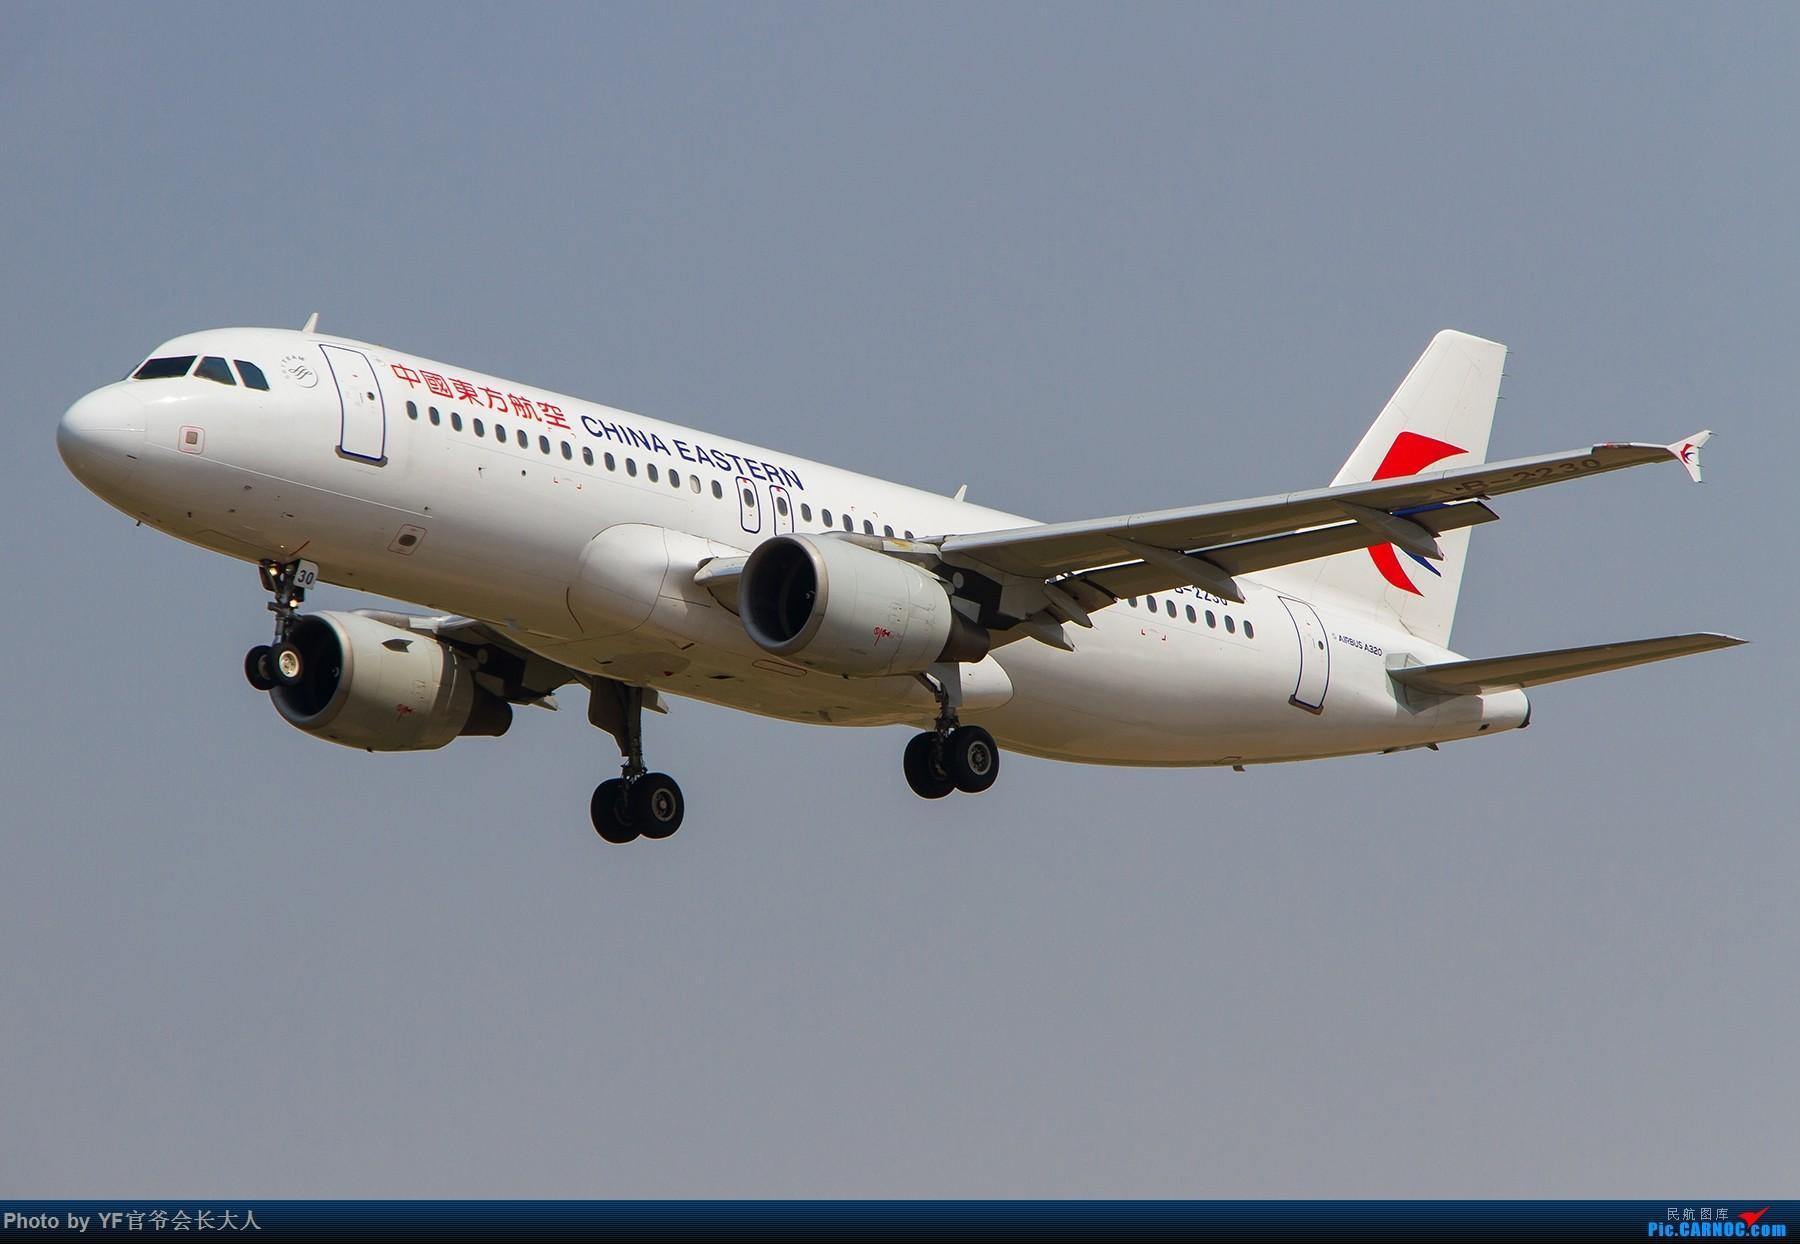 Re:[原创]【ZYTX】轻易不拍机,拍就要拍个过瘾!(新开的酷鸟,亚洲大西洋,顺带碰上朝韩两国的好货) AIRBUS A320-200 B-2230 中国沈阳桃仙国际机场